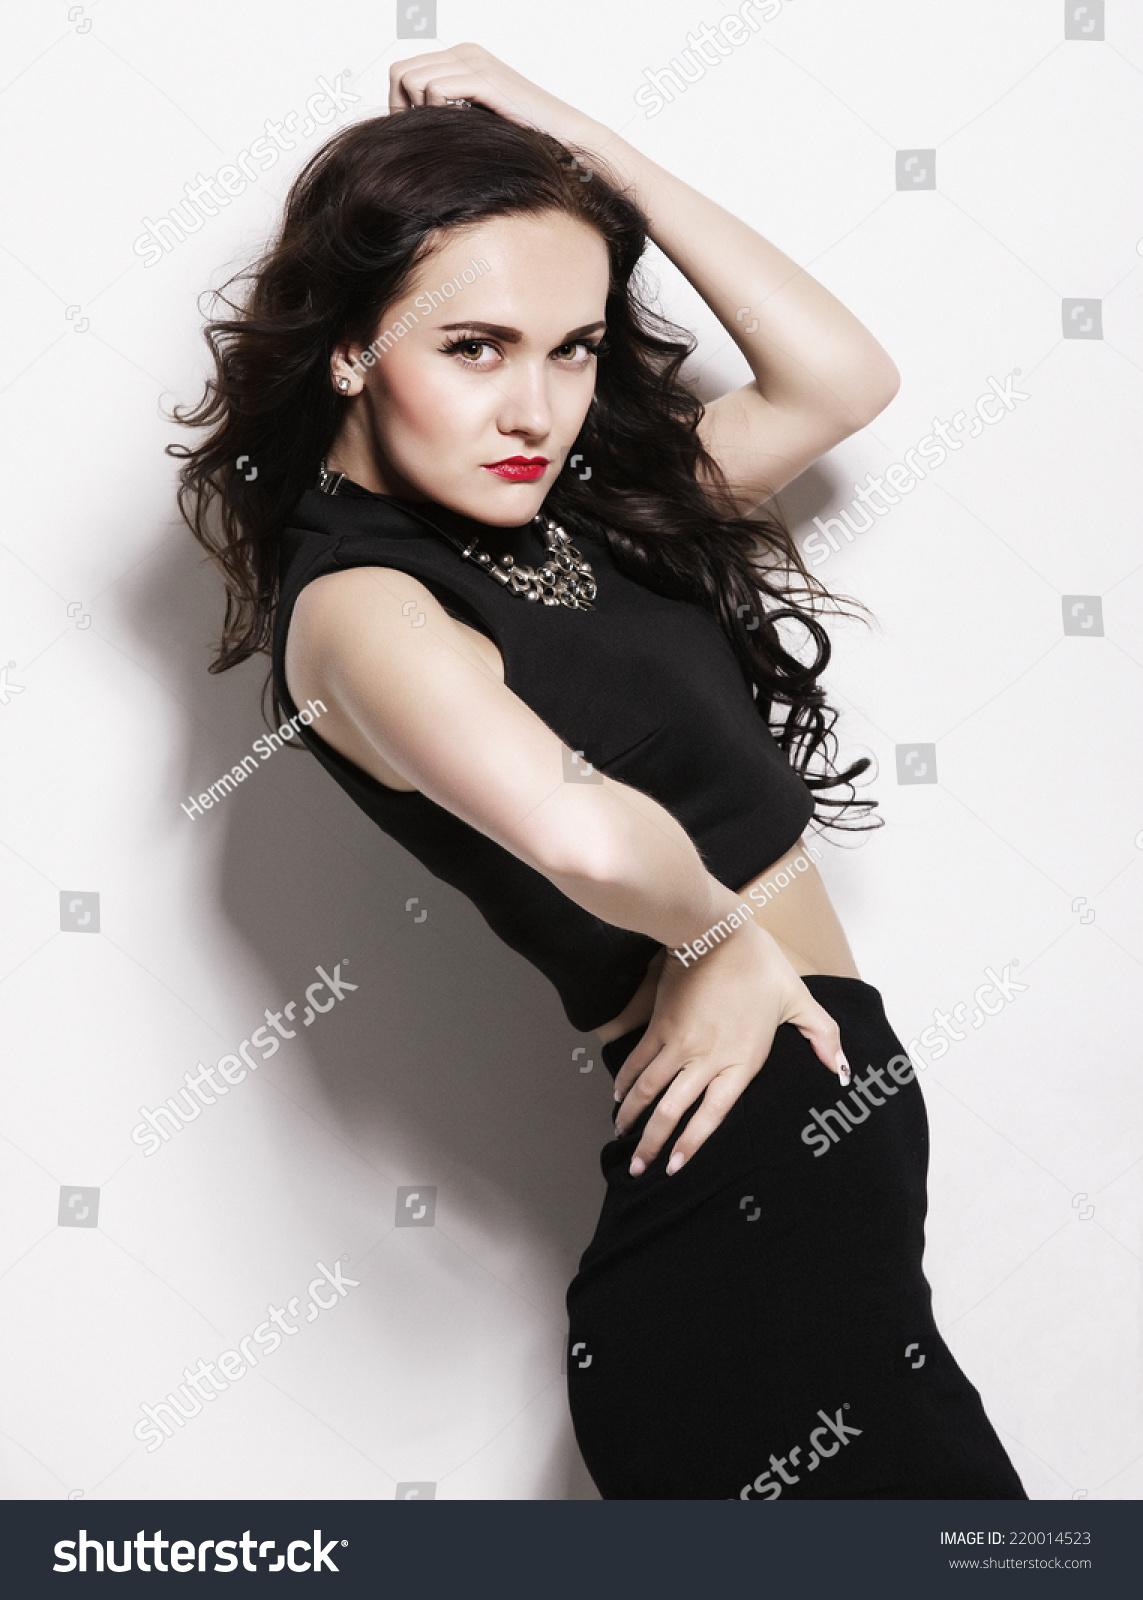 Fashion girl model posing on white background in the studio. Always more on  my portfolio